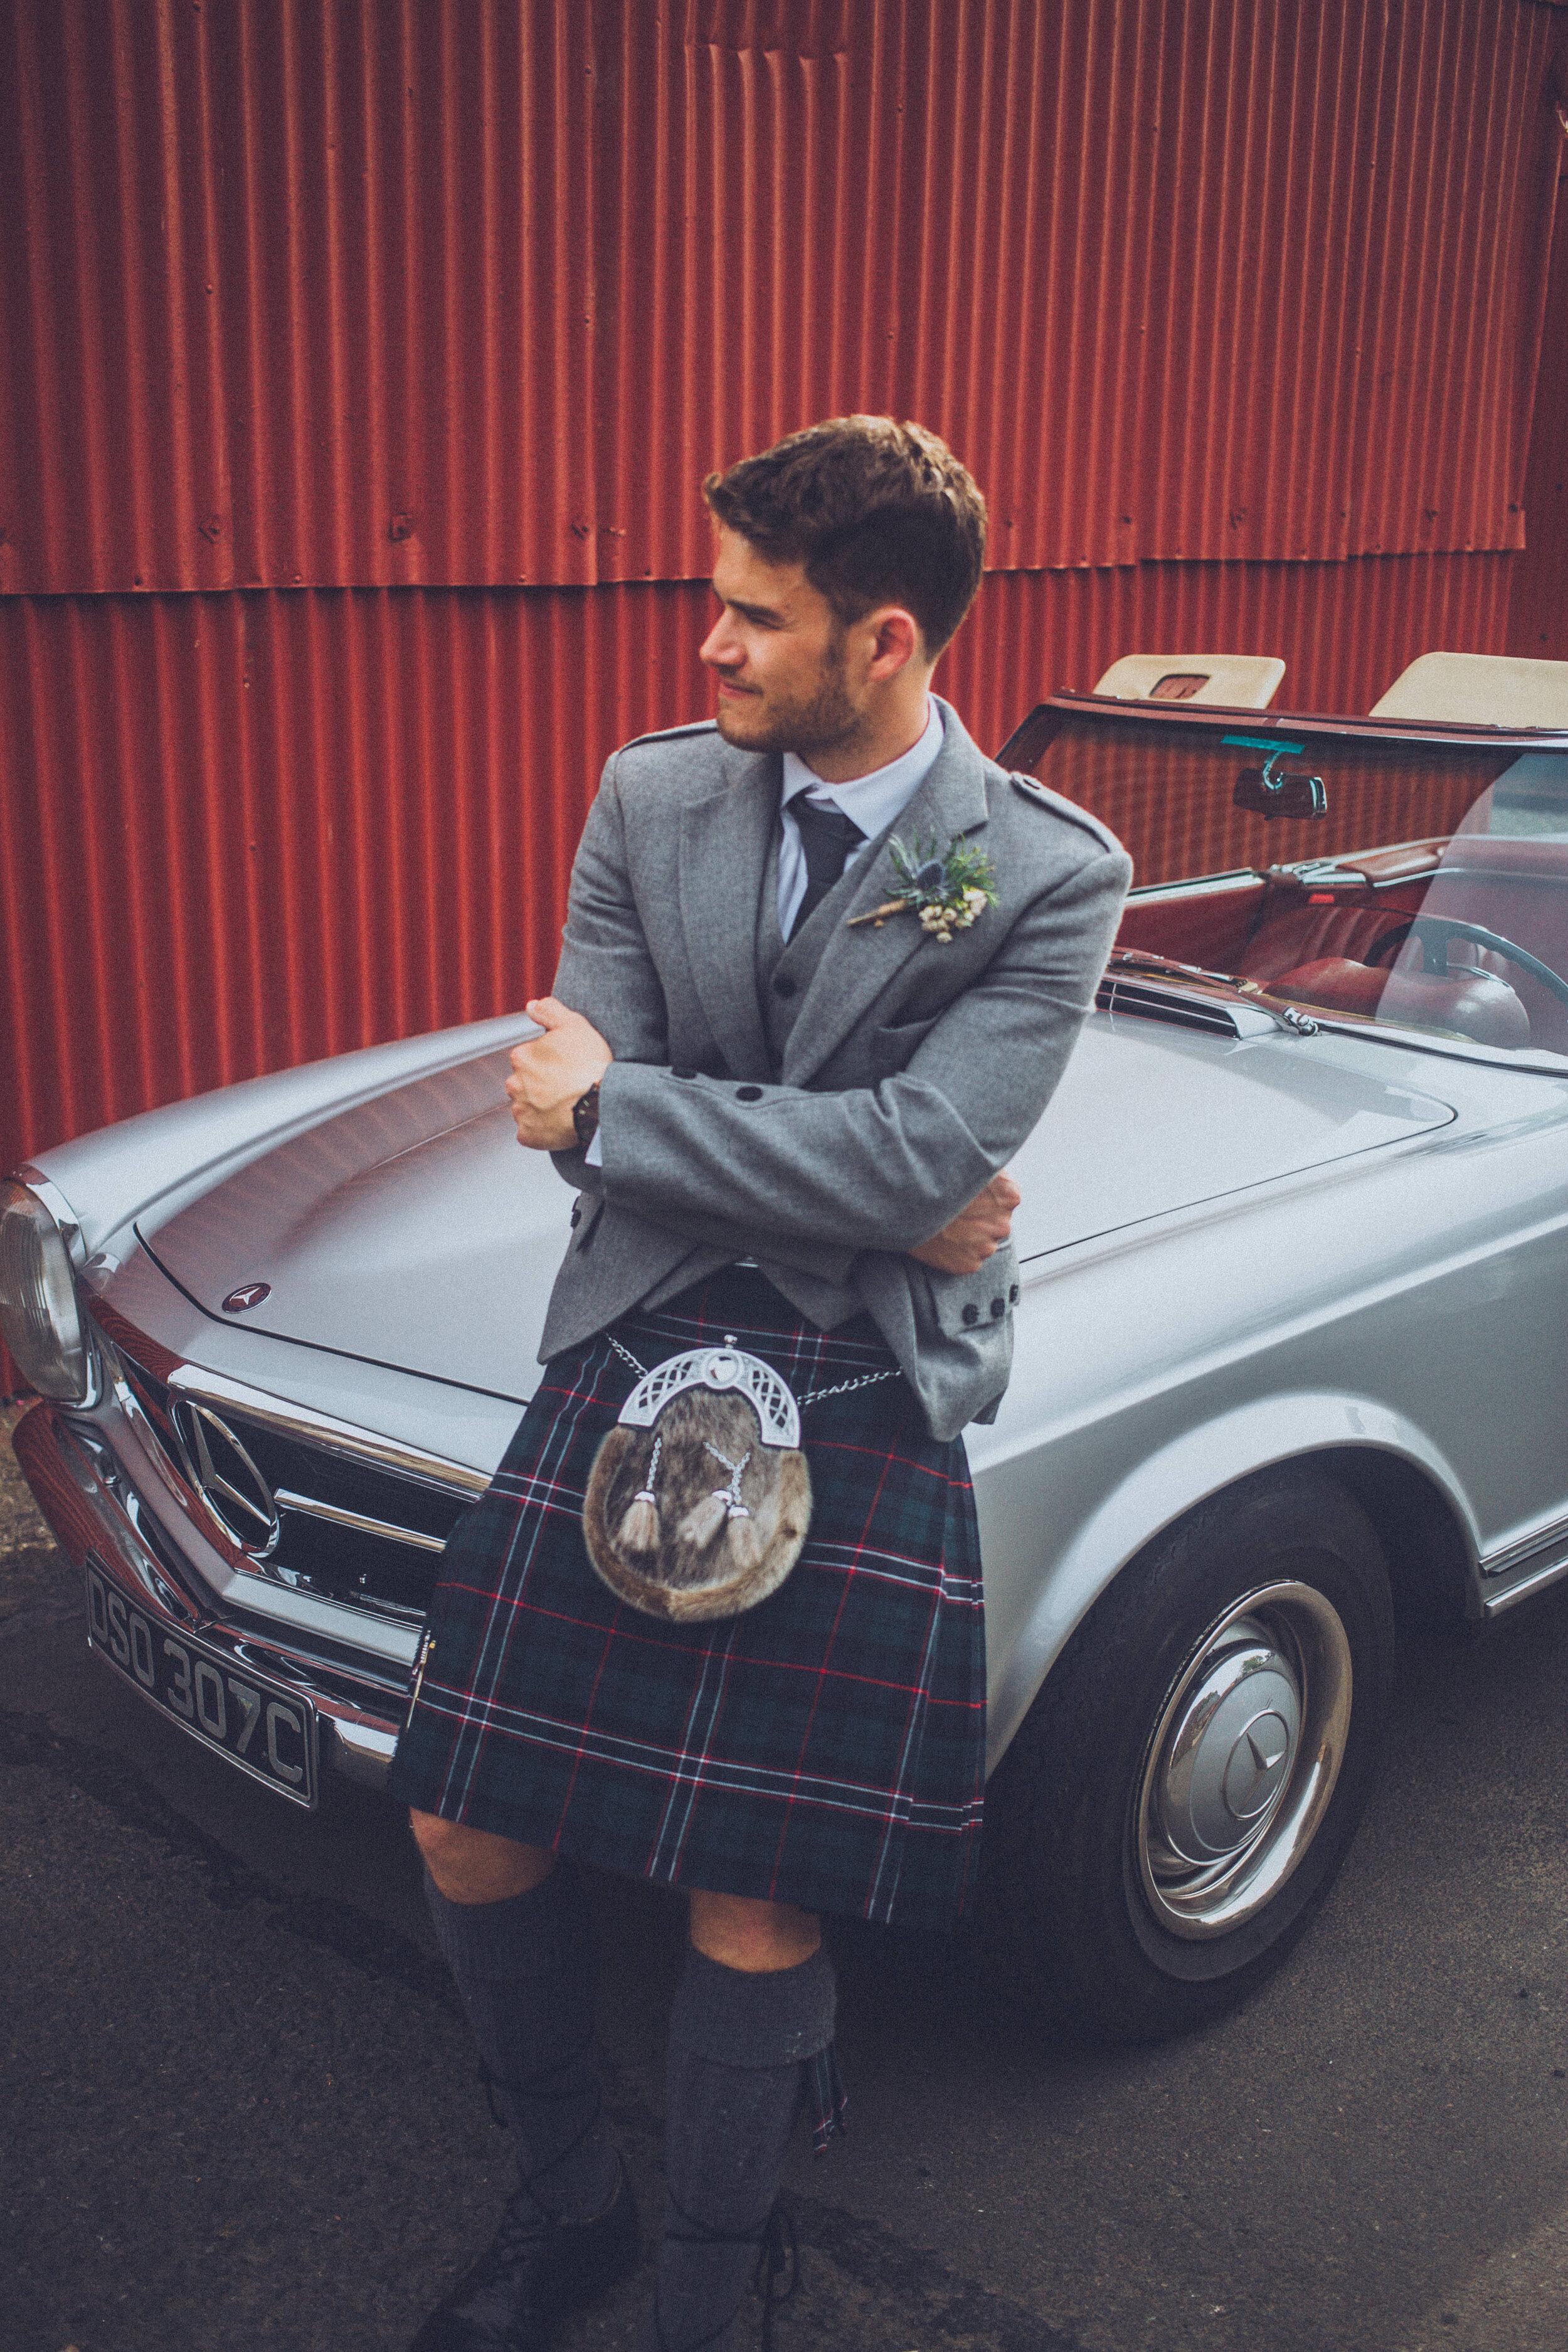 Dalduff Farm Ayrshire Wedding Photography - Claire Basiuk Photographer - 23.jpg